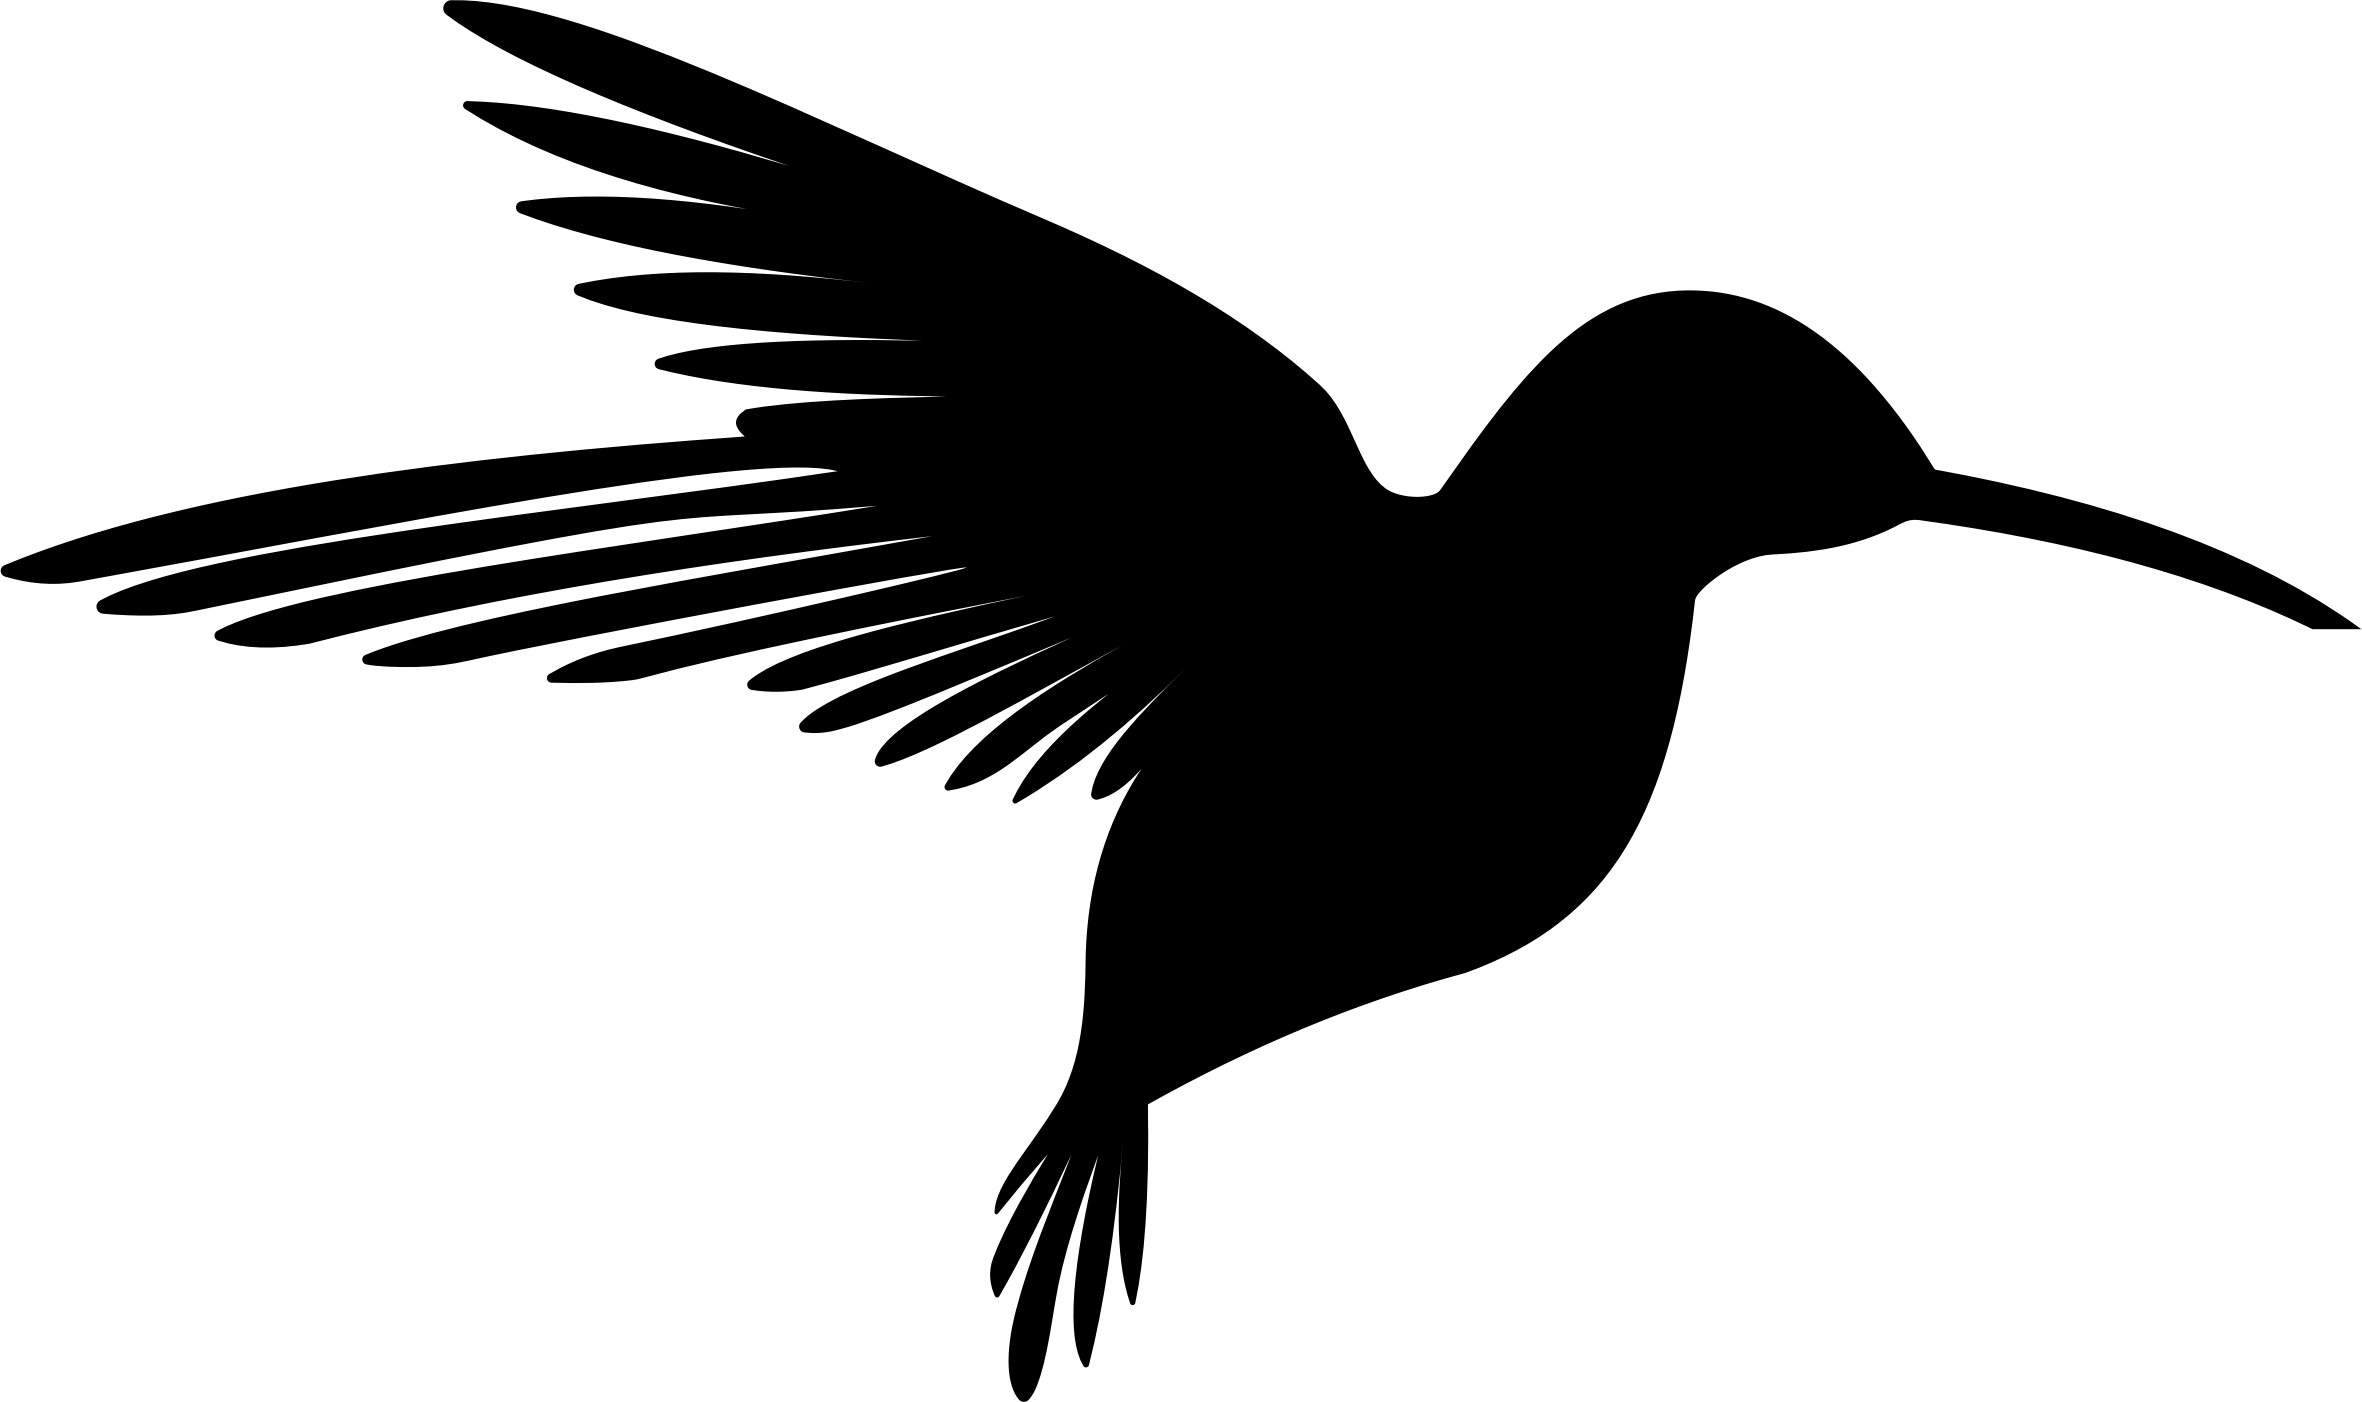 Clipart - Hummingbird Silhouette 3